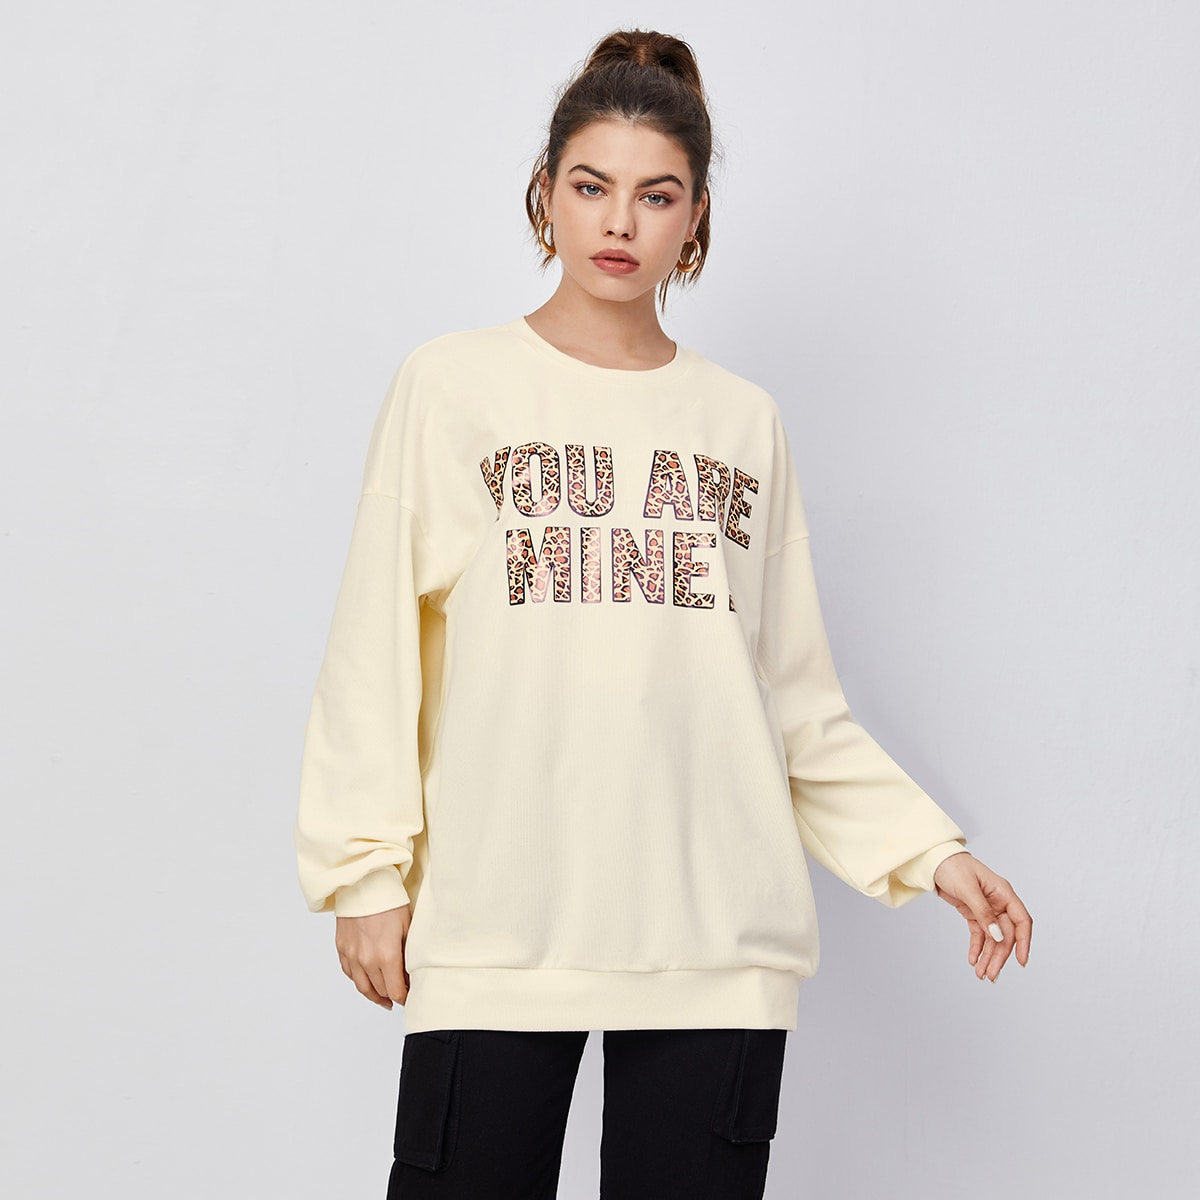 SHEIN Casual Slogan Sweatshirt